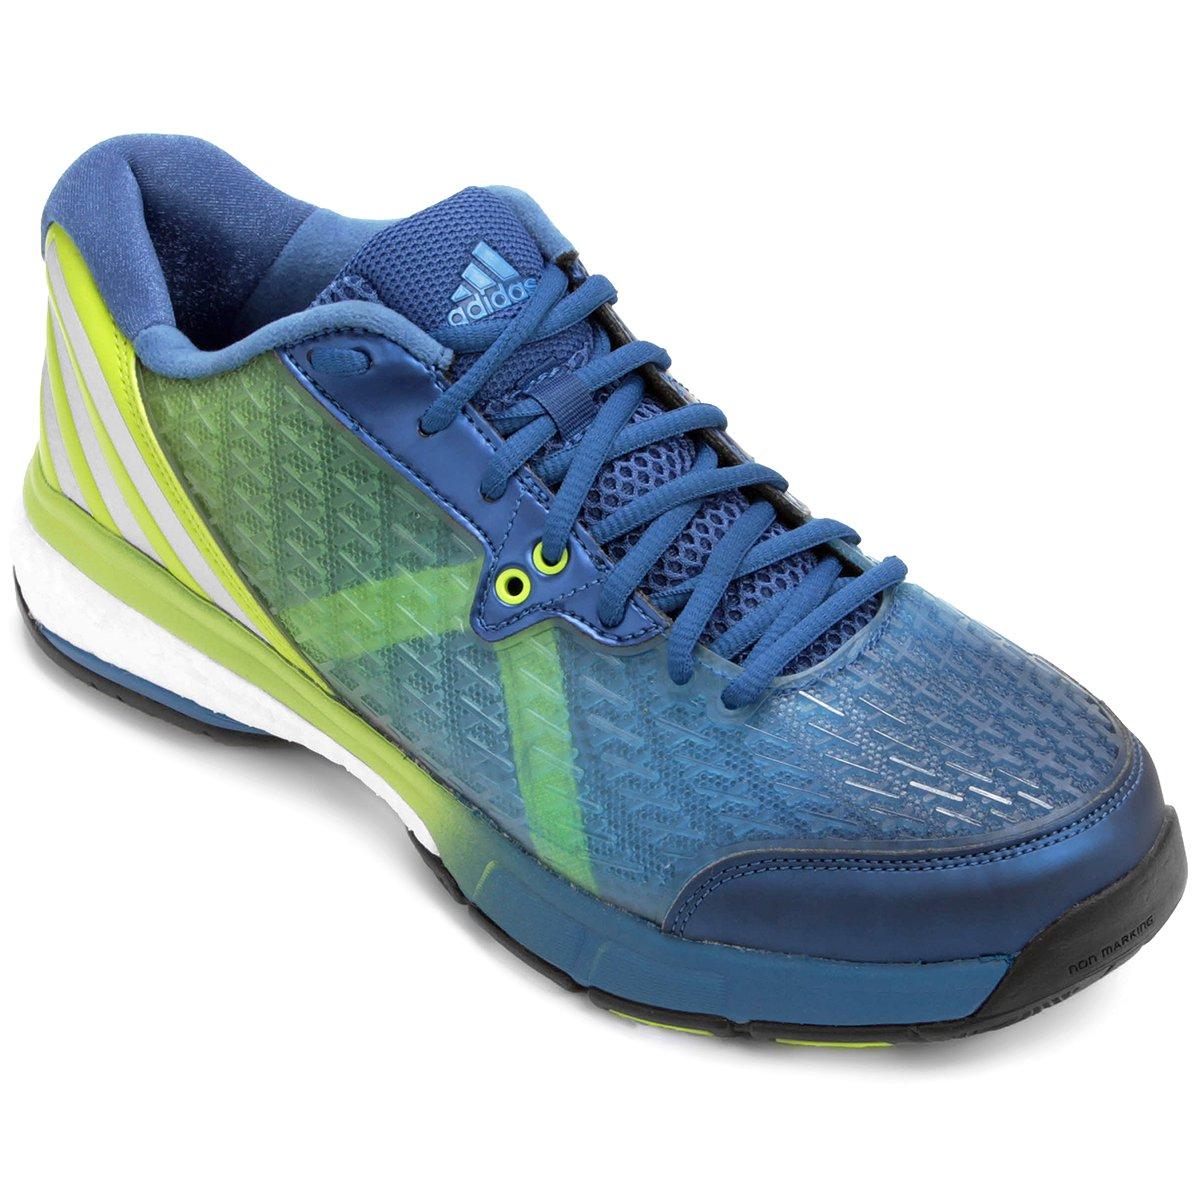 fd64e66720d Tênis Adidas Energy Volley Boost 2 - Compre Agora